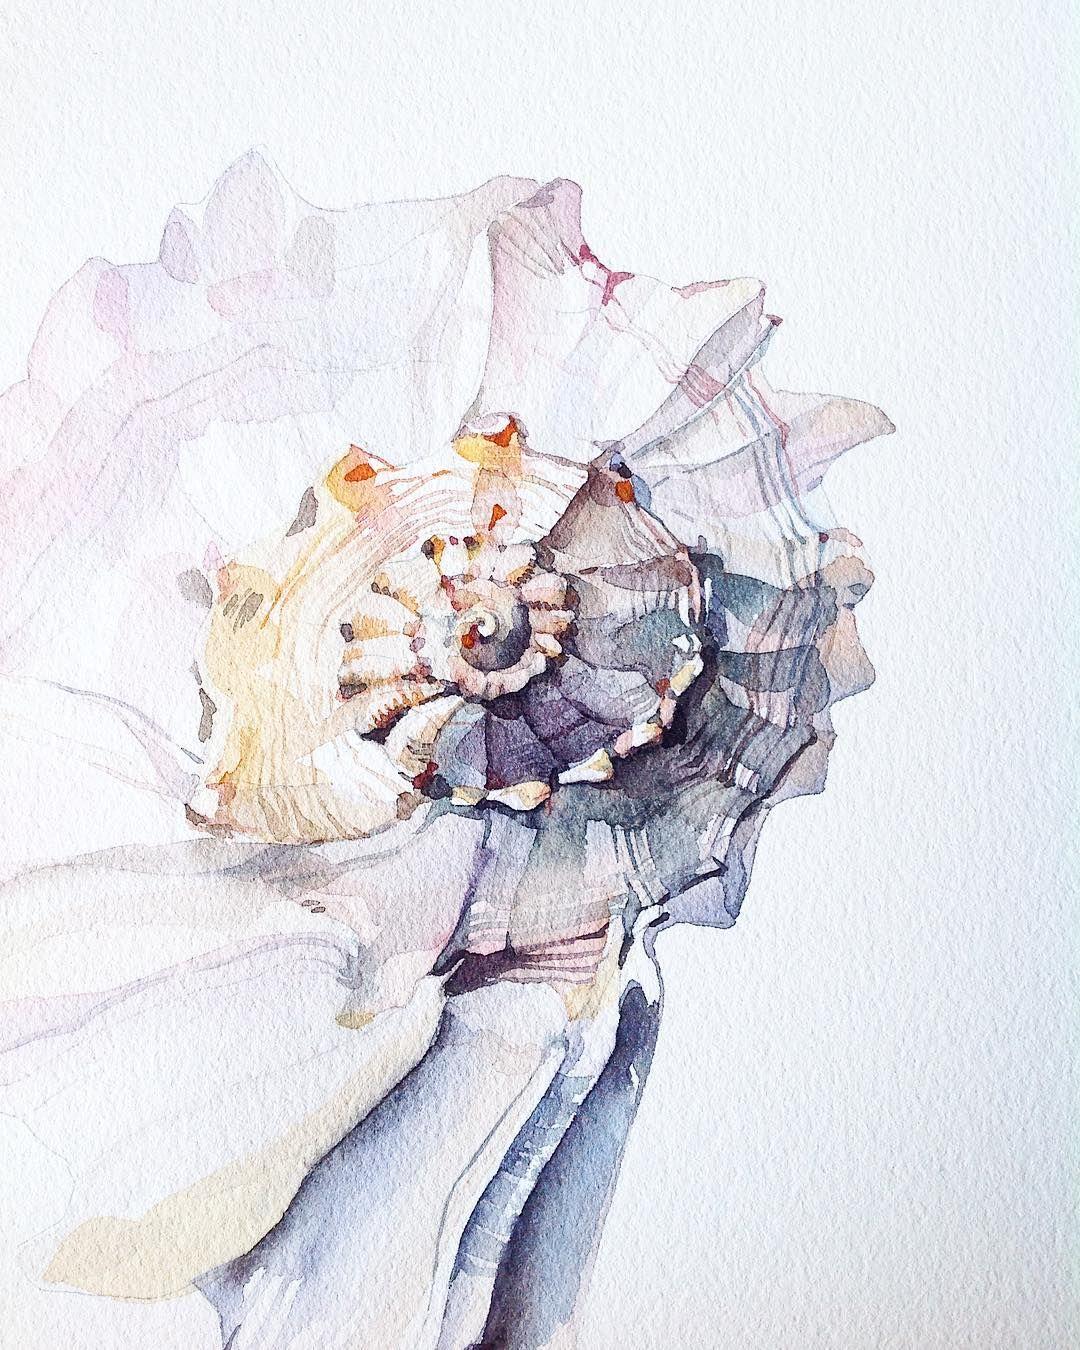 Кусочек соленой свежести вам #misha_illustration#sea#watercolor#watercolour#waterblog#aquarelle#artblog#art#artist#art_we_inspire#artwork#artgallery#arts_help#topcreator#draw#drawing#paint#painting#watercolorpainting#акварель#иллюстрация#instaar#workingprogress by katerina_mihailina_07